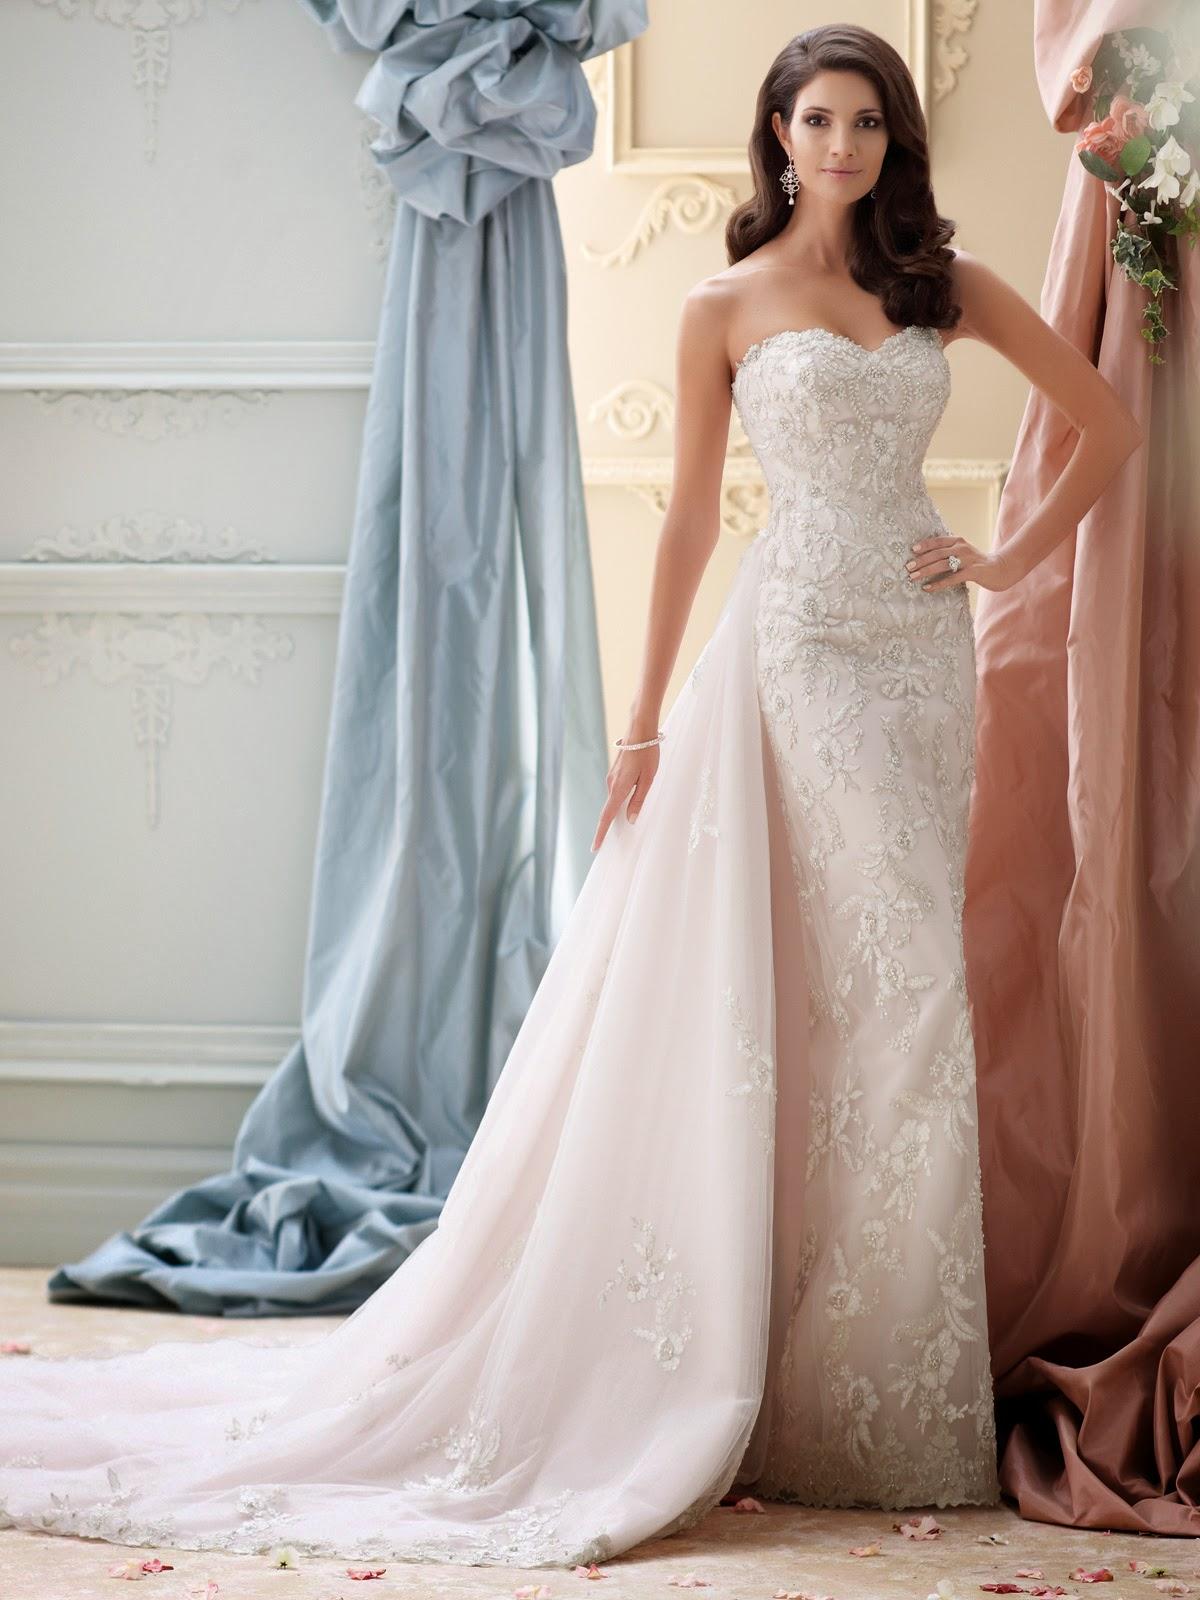 Sleepless in DIY Bride Country : Wedding Wednesday: Blushing Bridal ...